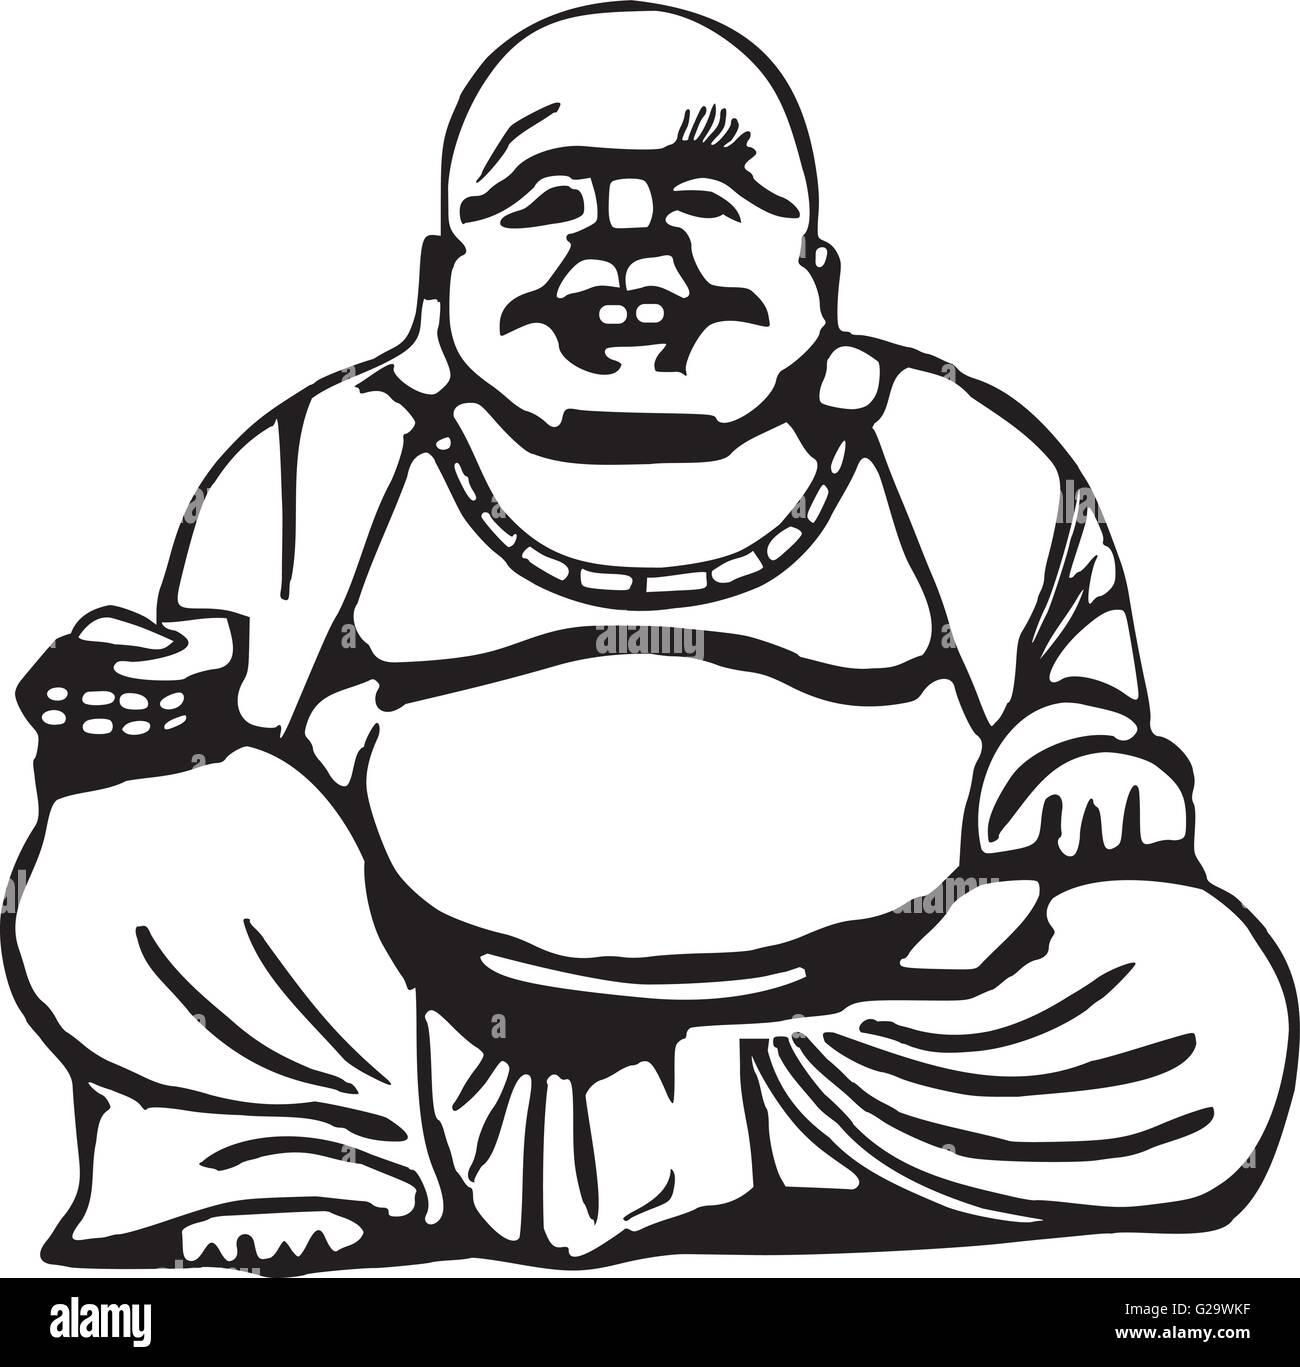 Happy Buddha Stock Vector Images - Alamy